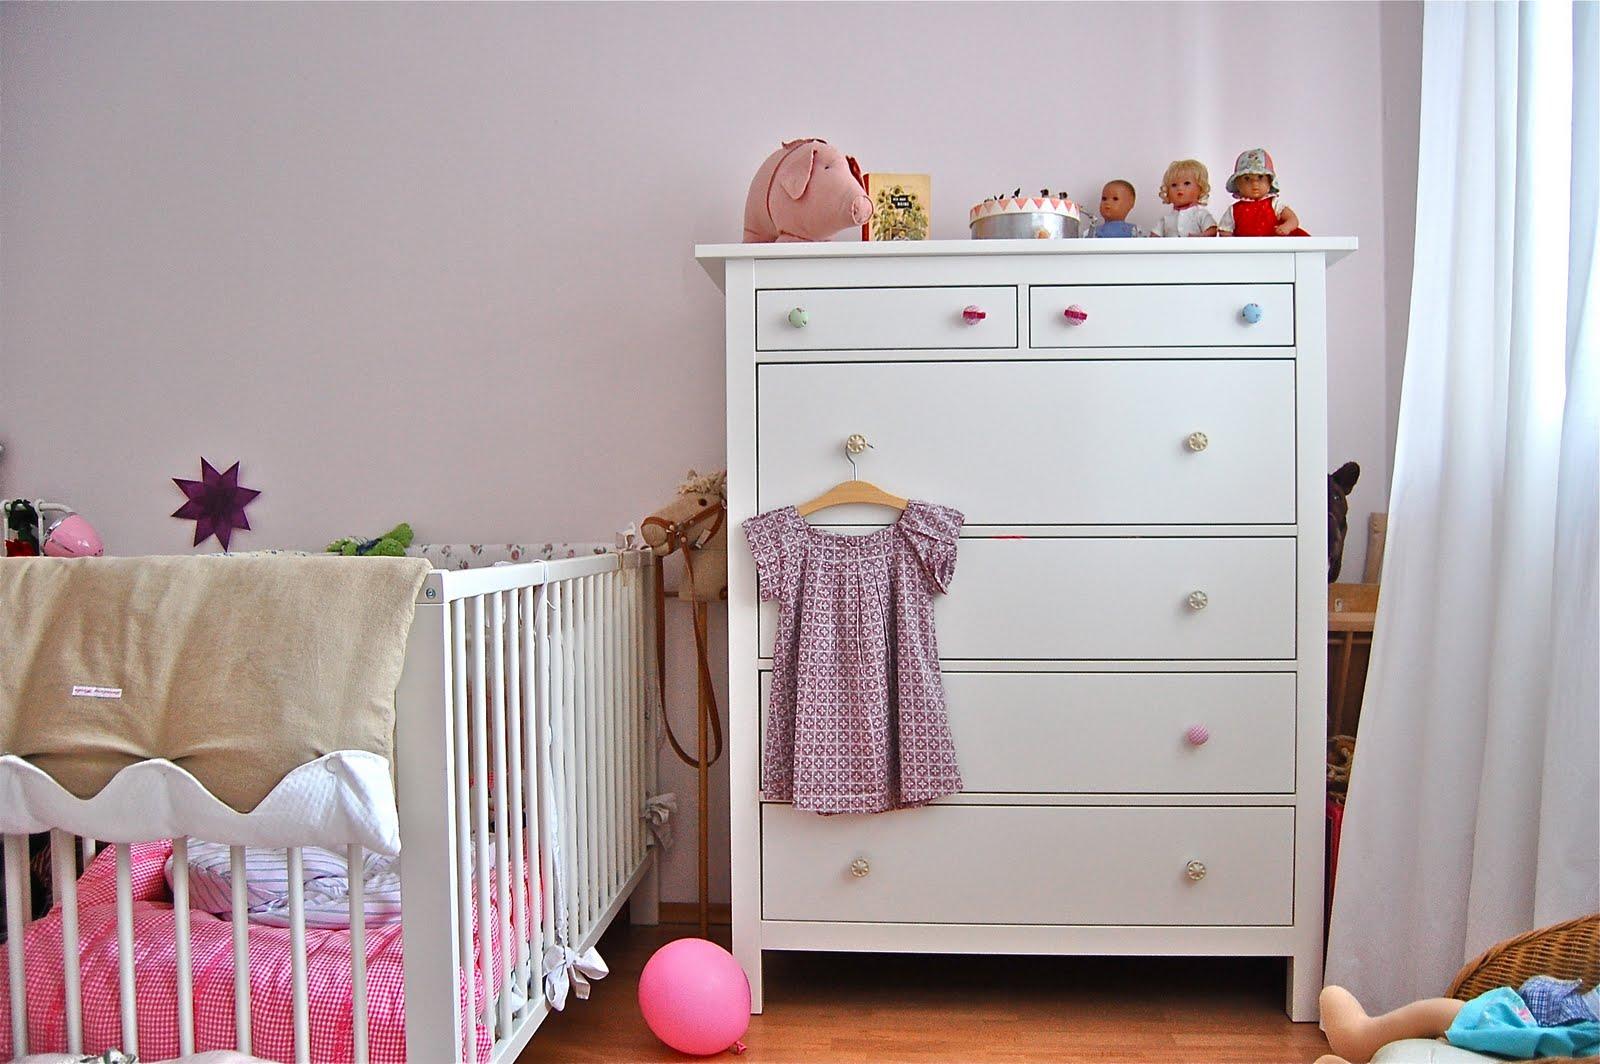 wie kann man ikea m bel versch nern. Black Bedroom Furniture Sets. Home Design Ideas